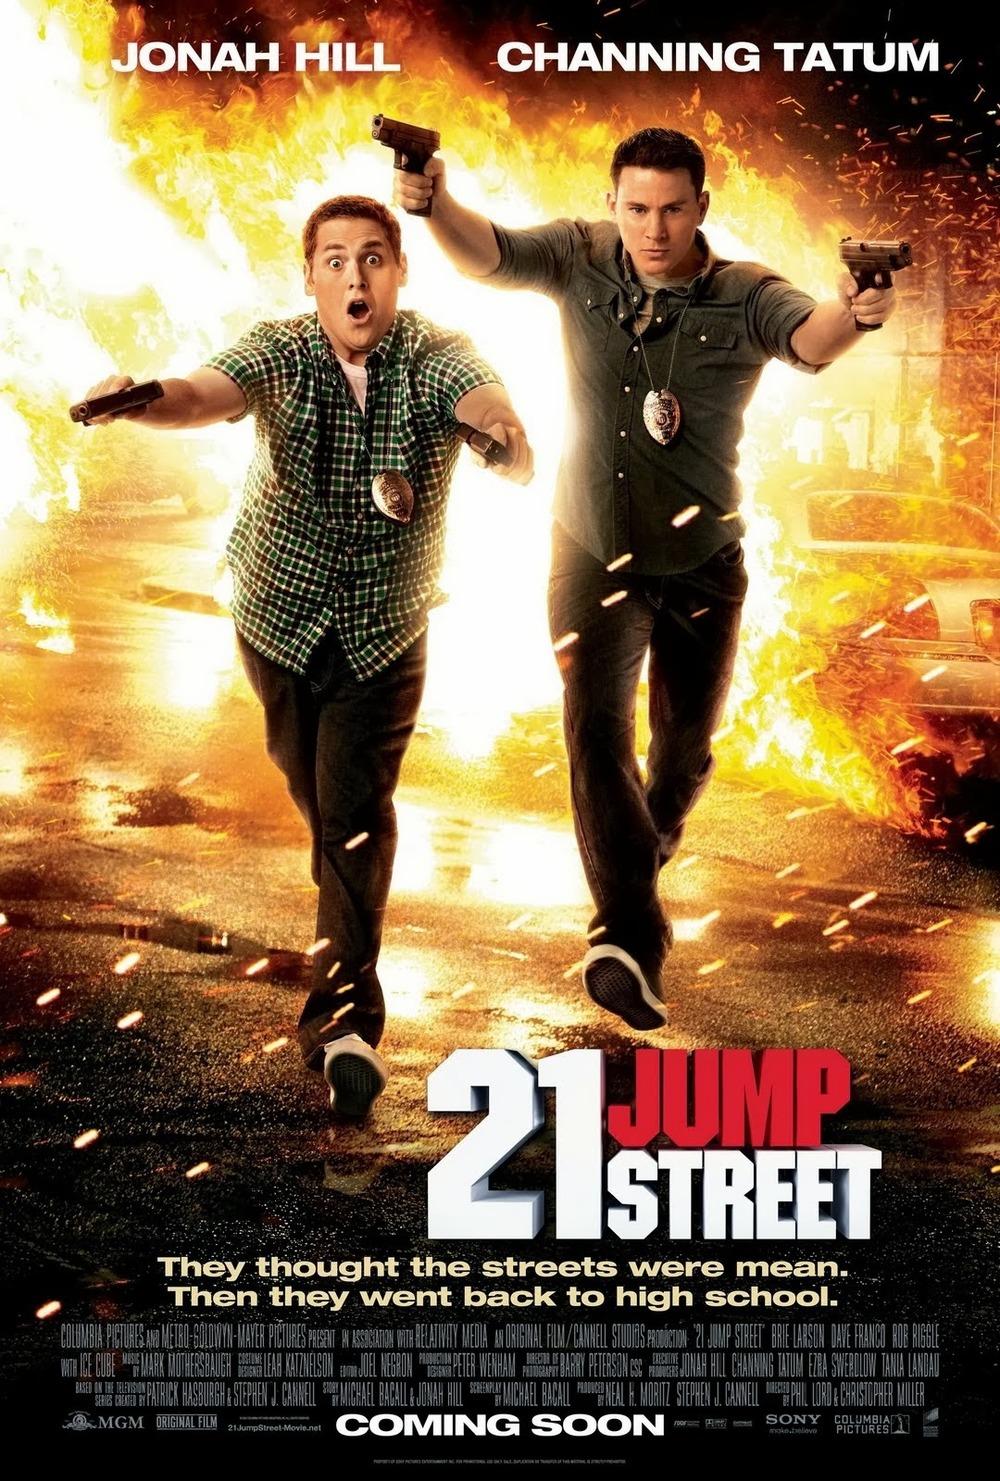 international-trailer-for-22-jump-street